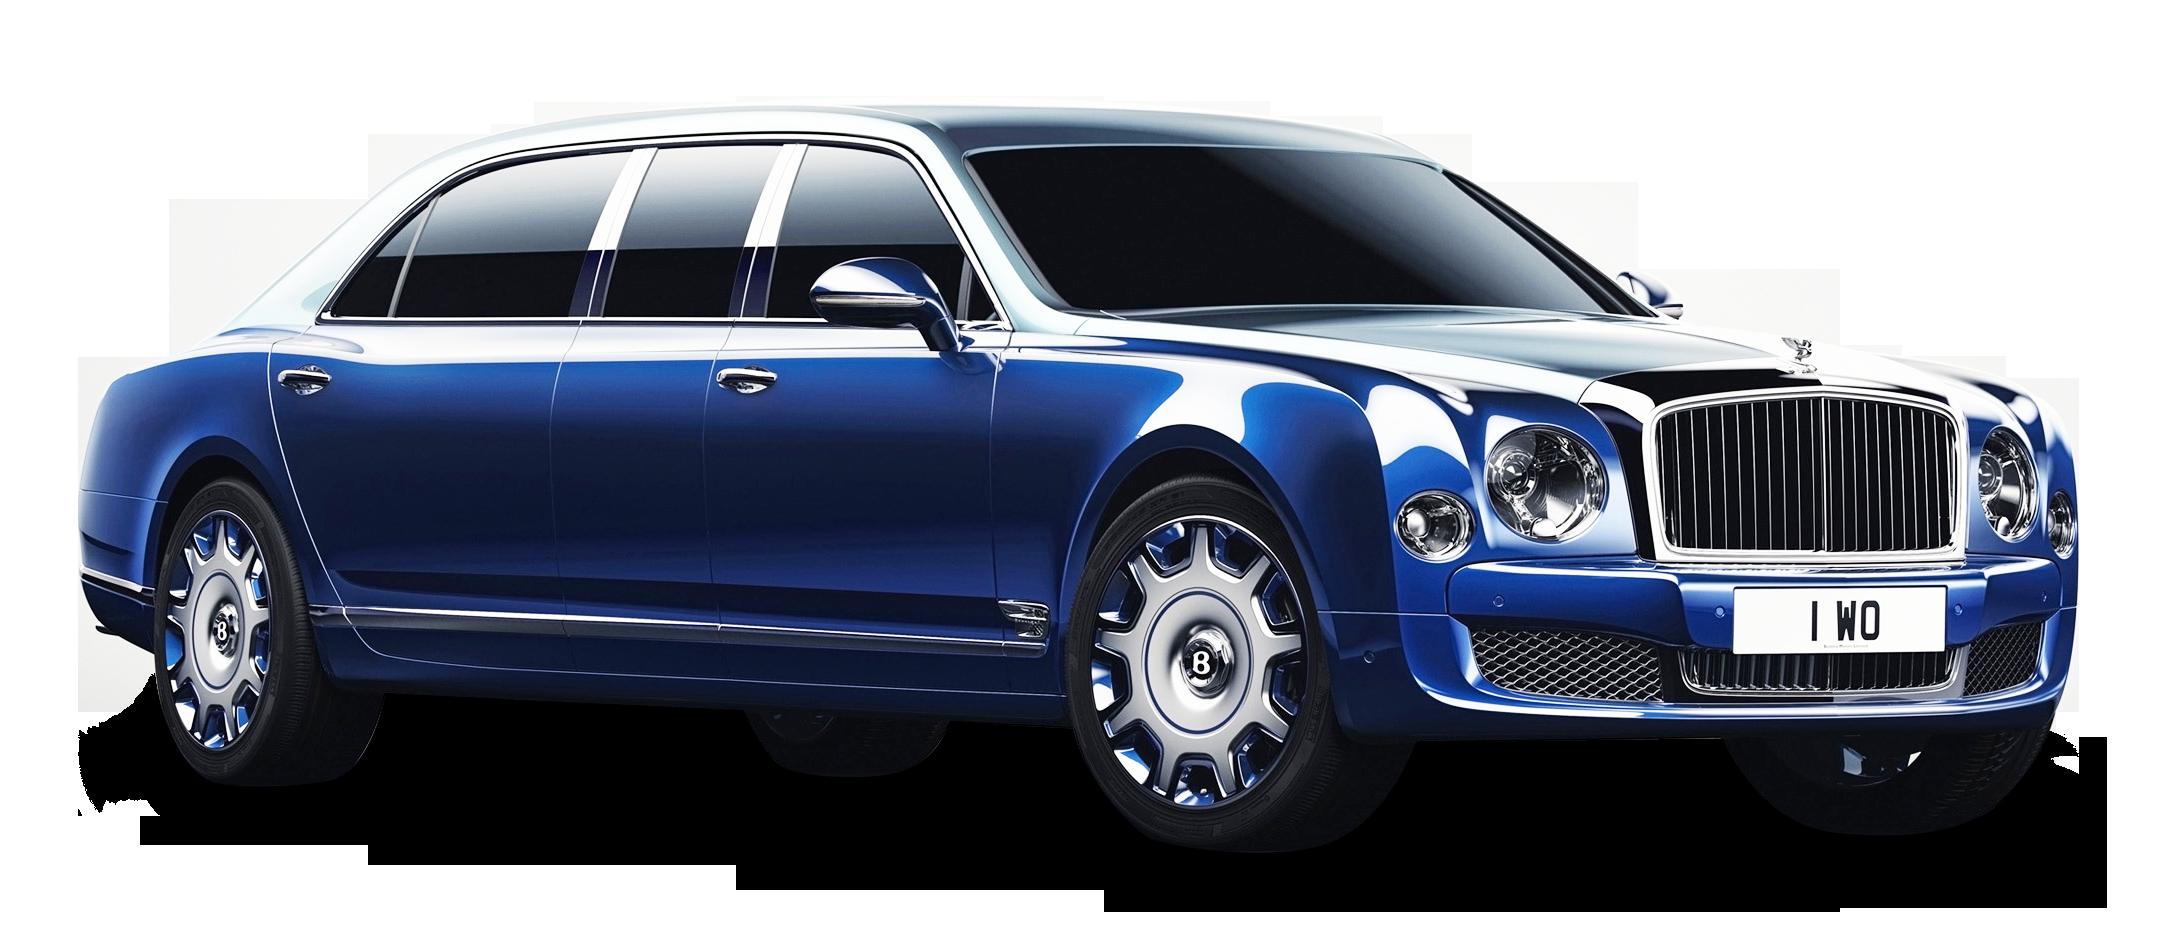 Bentley Mulsanne Grand Limousine Blue Car